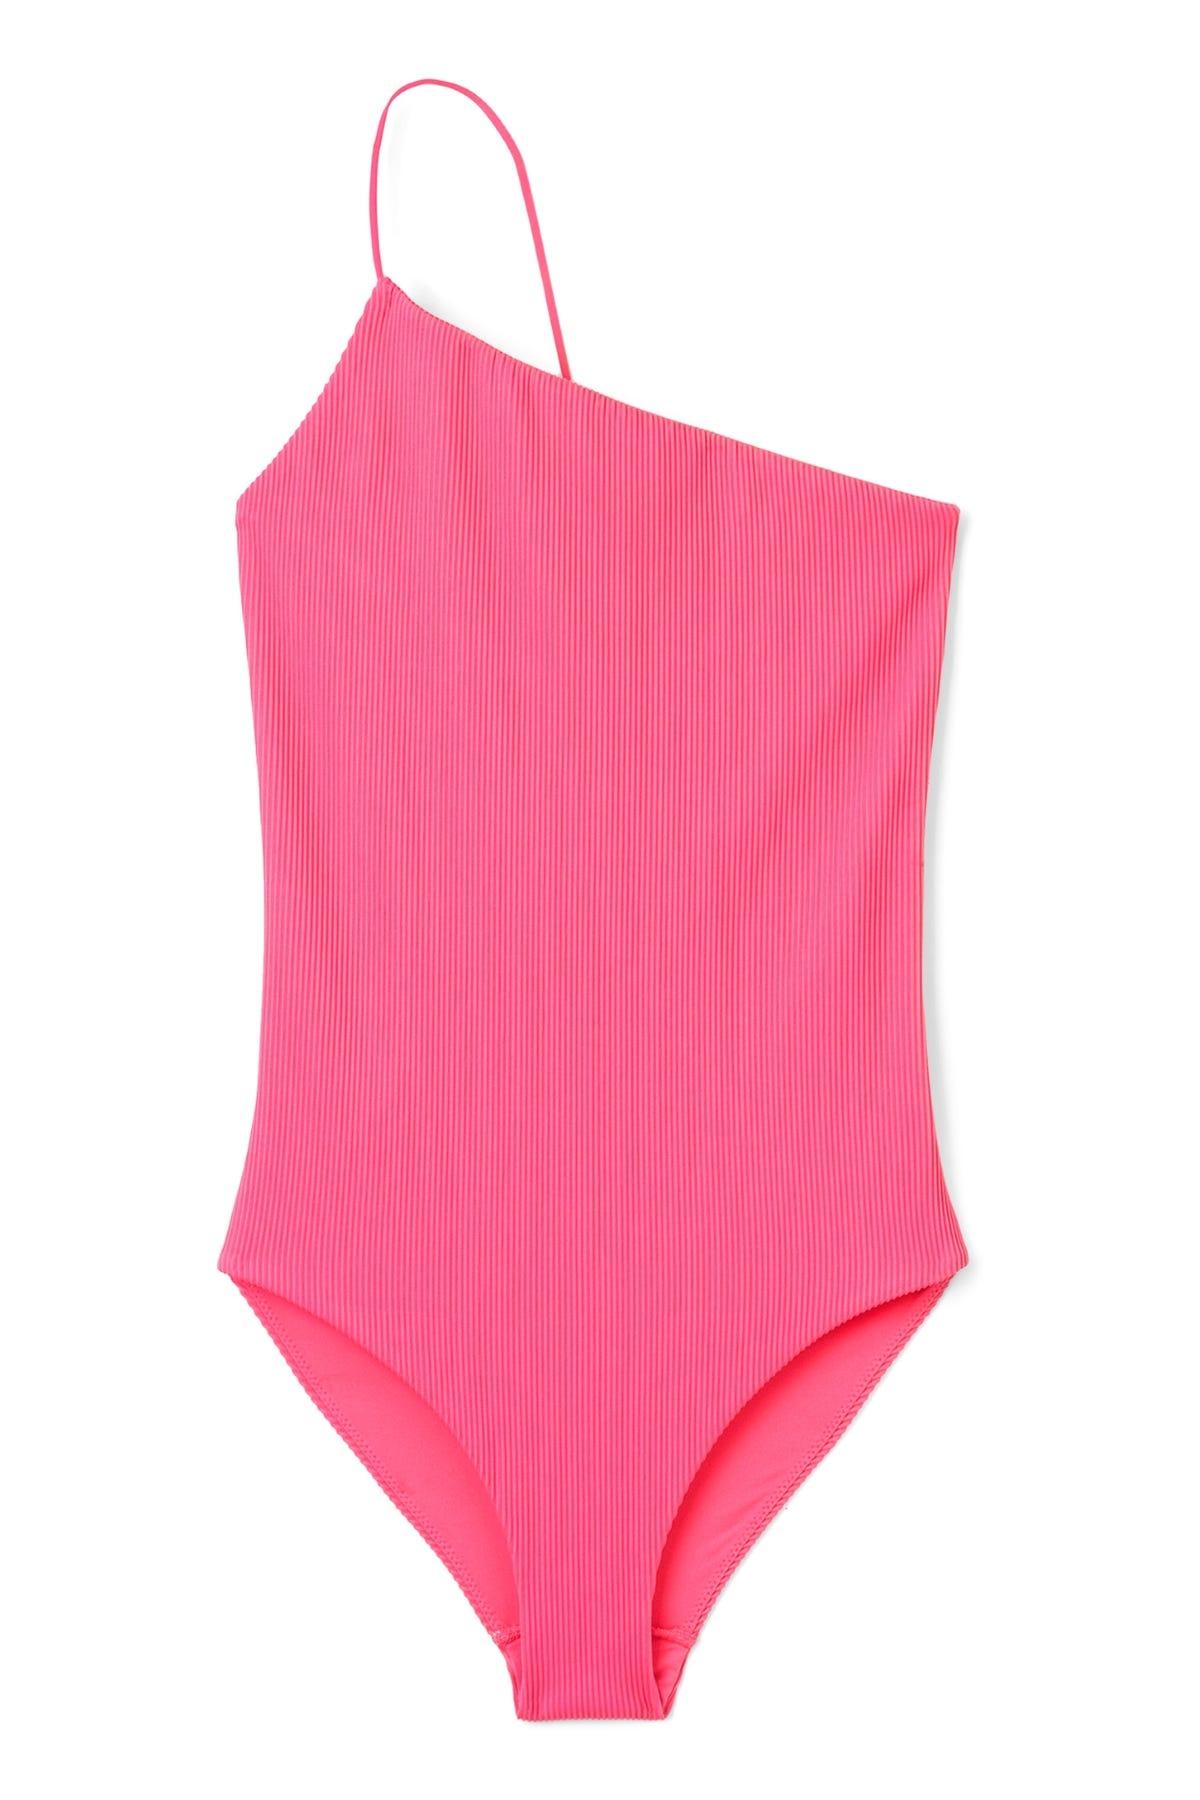 44a63c3b2a Spring Summer Swimwear Bikinis Swimsuits